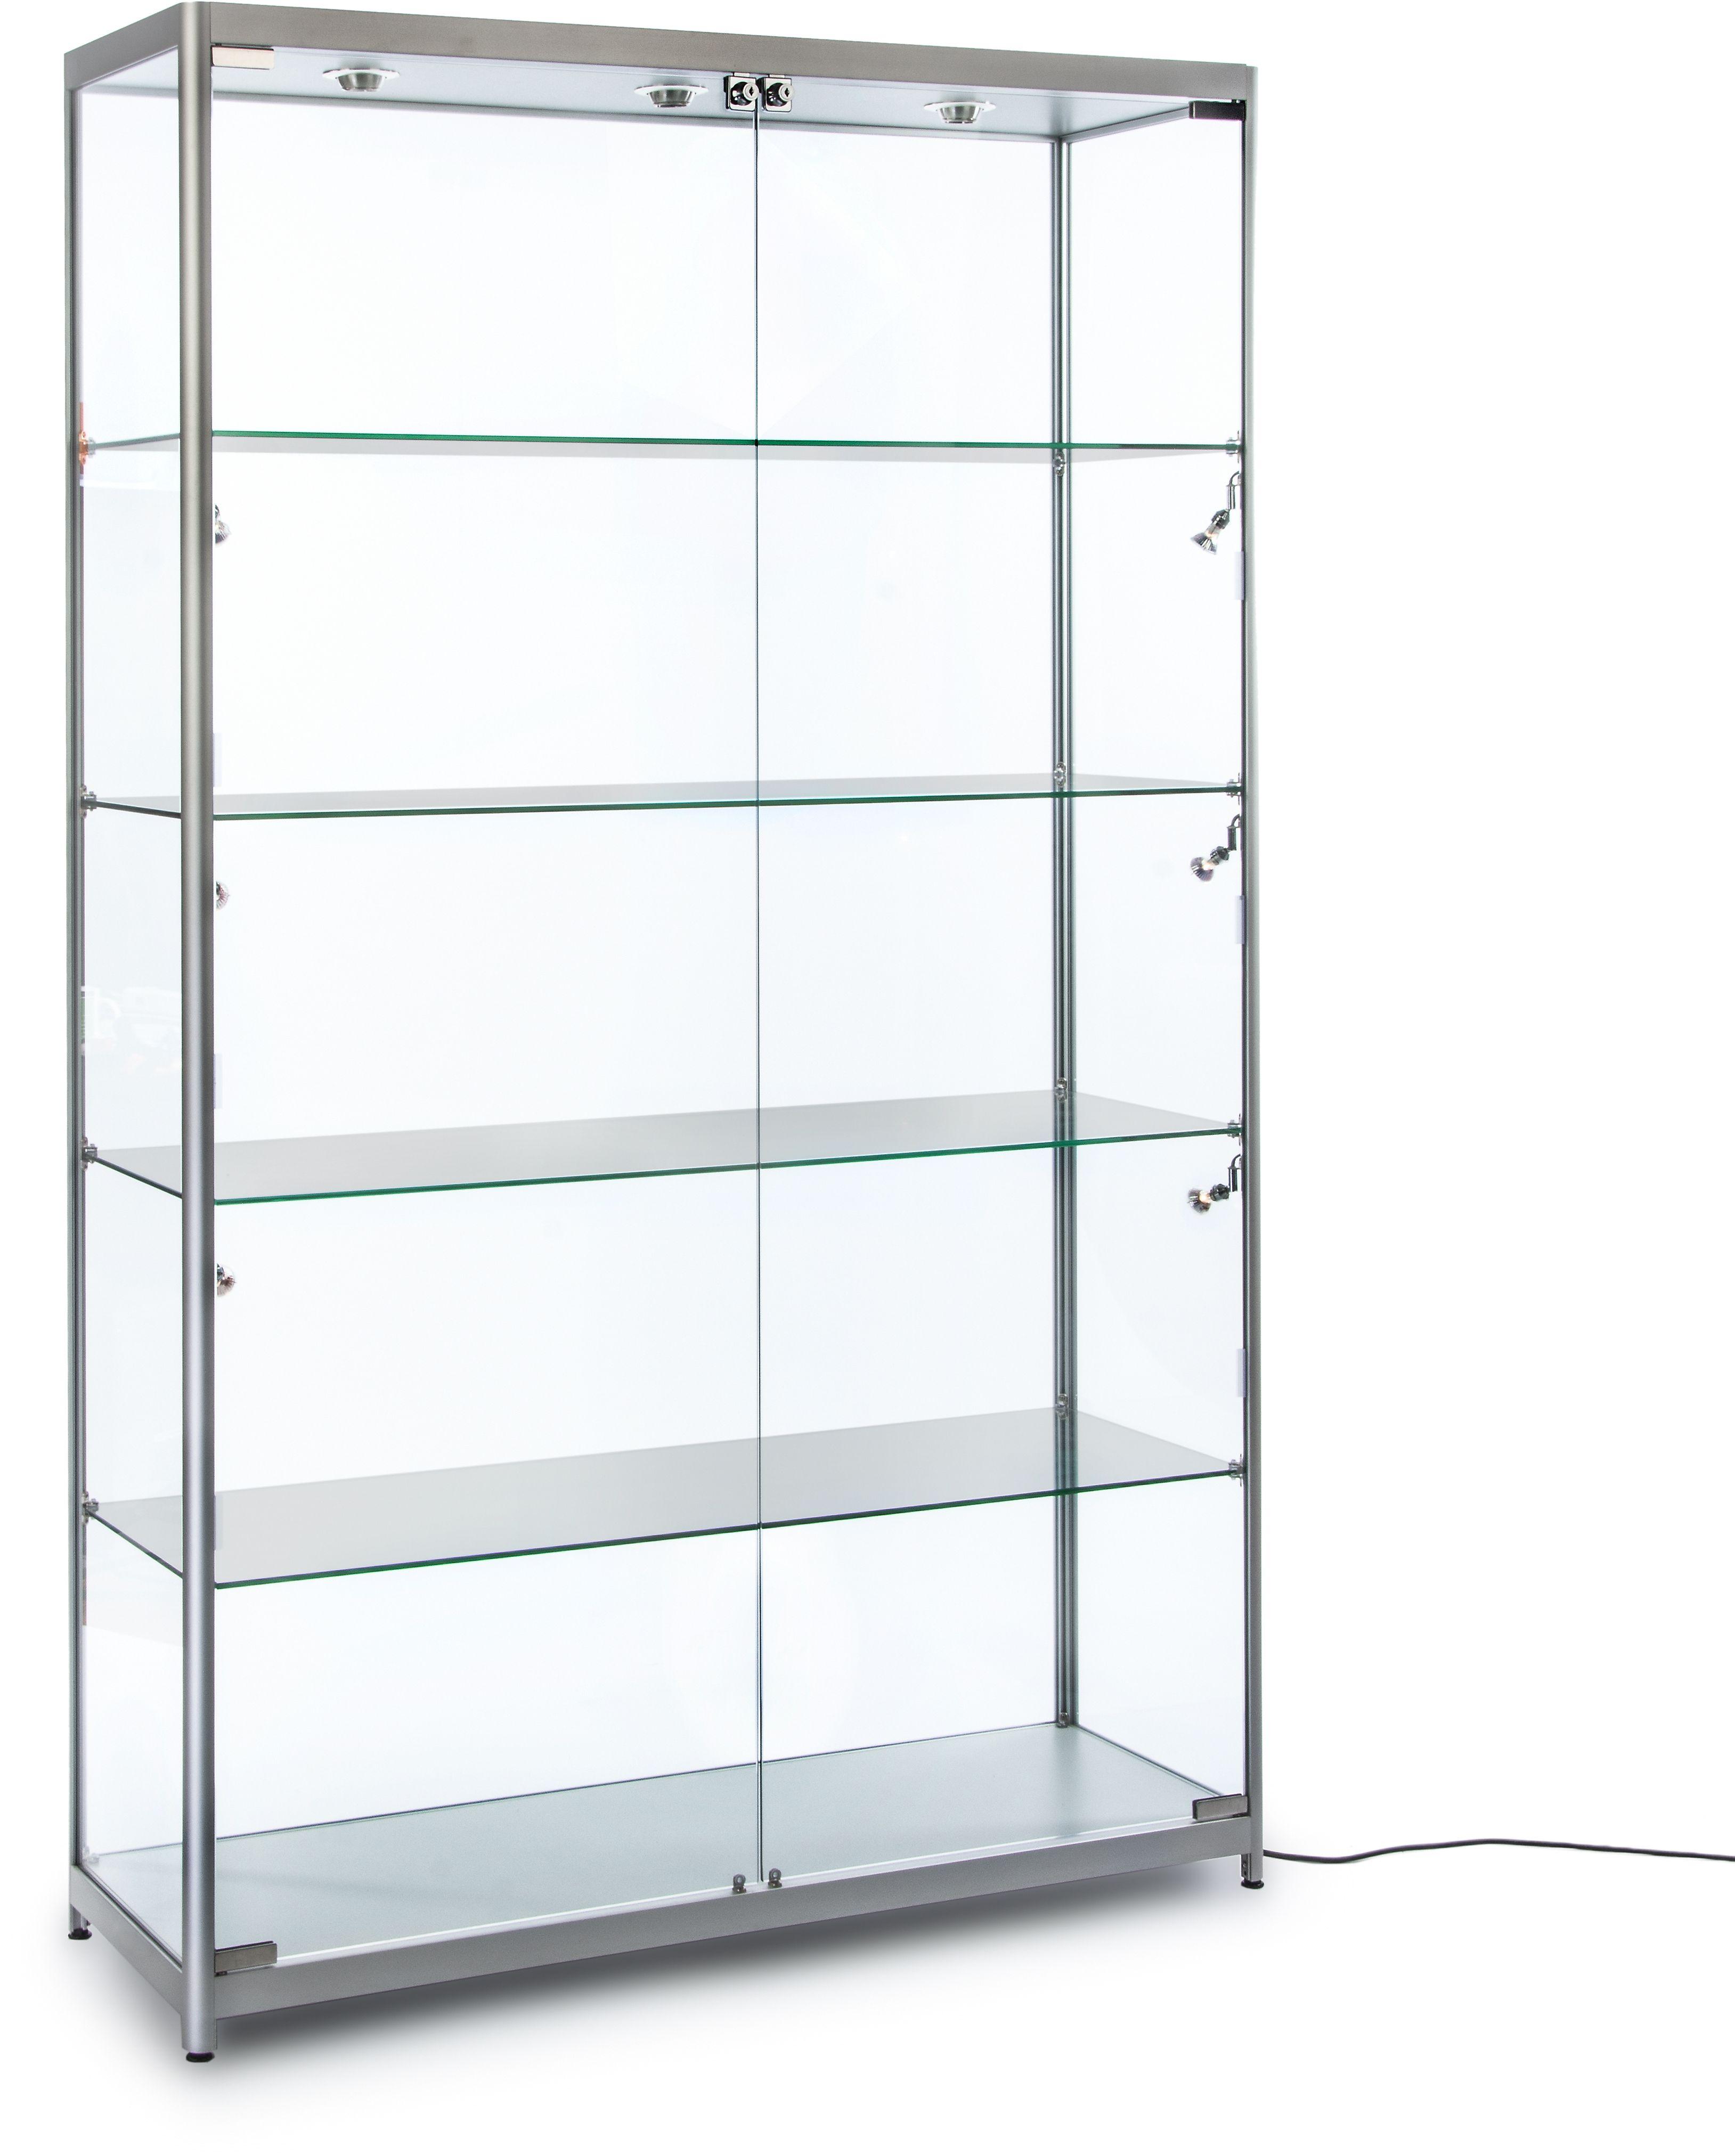 48 Display Case W 9 Halogen Top Side Lights 4 Fixed Shelves Hinged Doors Silver Shelves Glass Wall Shelves Glass Shelves